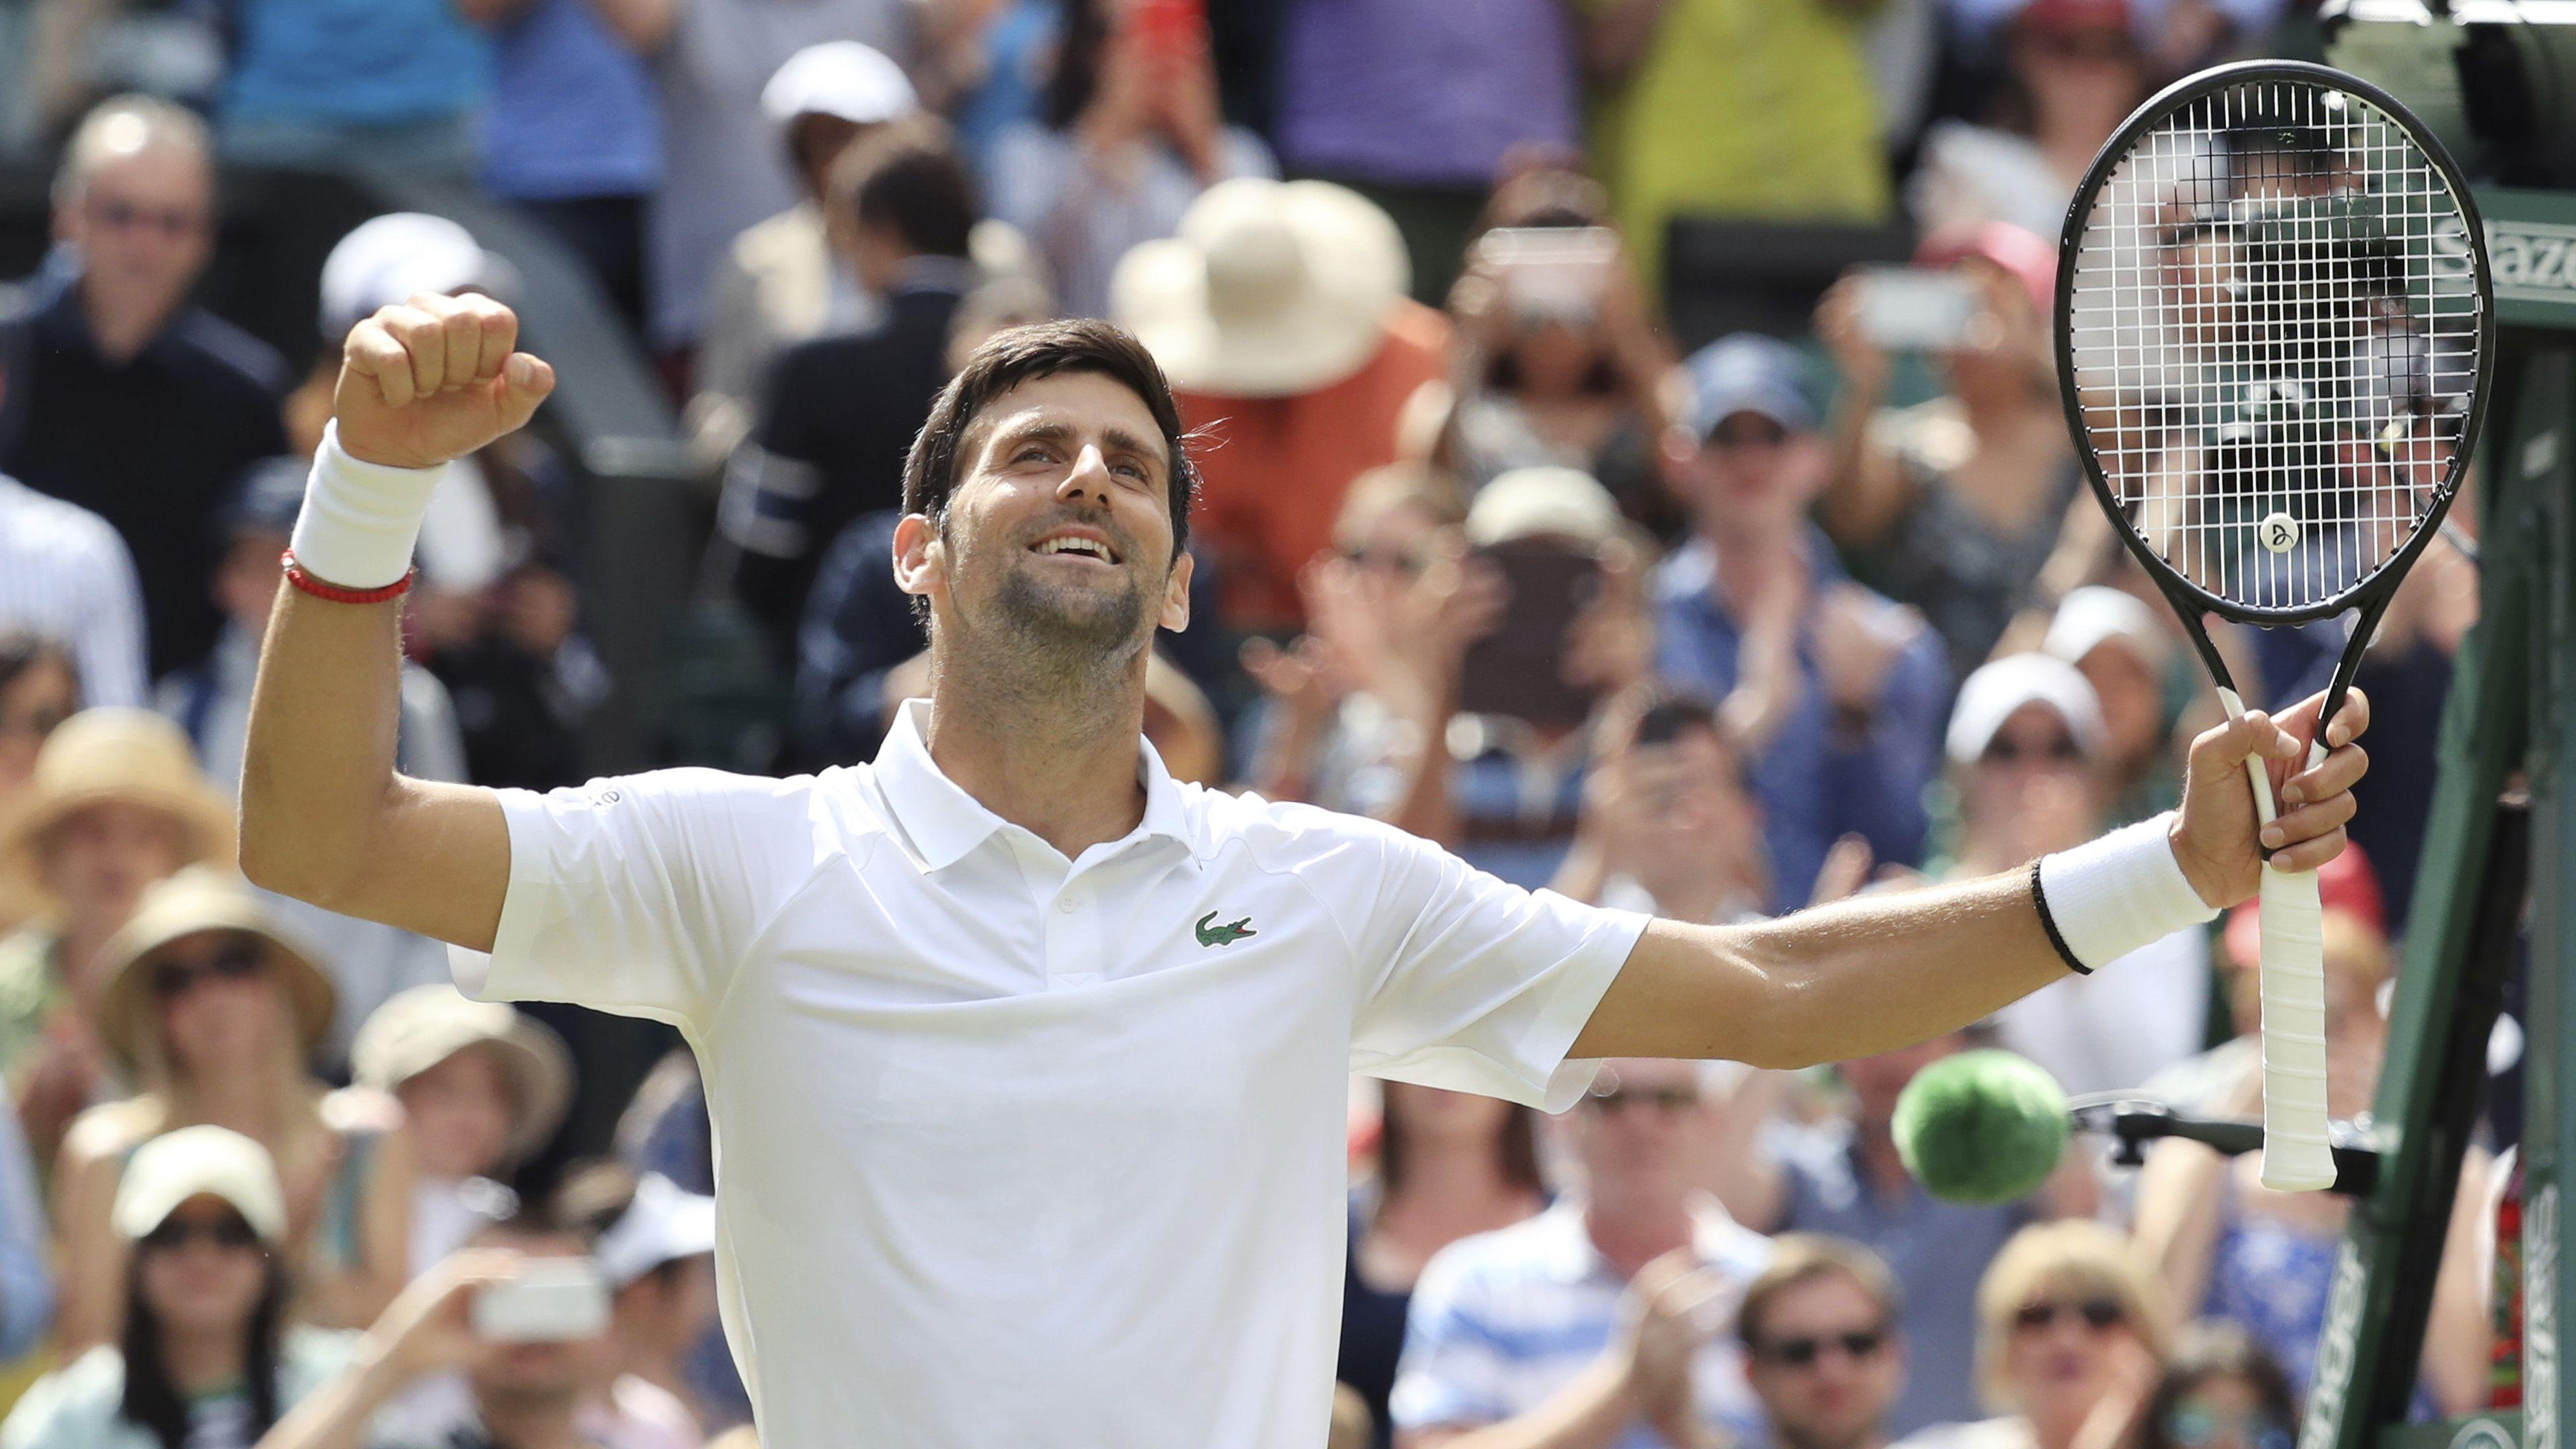 Djokovic, Federer, Nadal lead older charge at Wimbledon